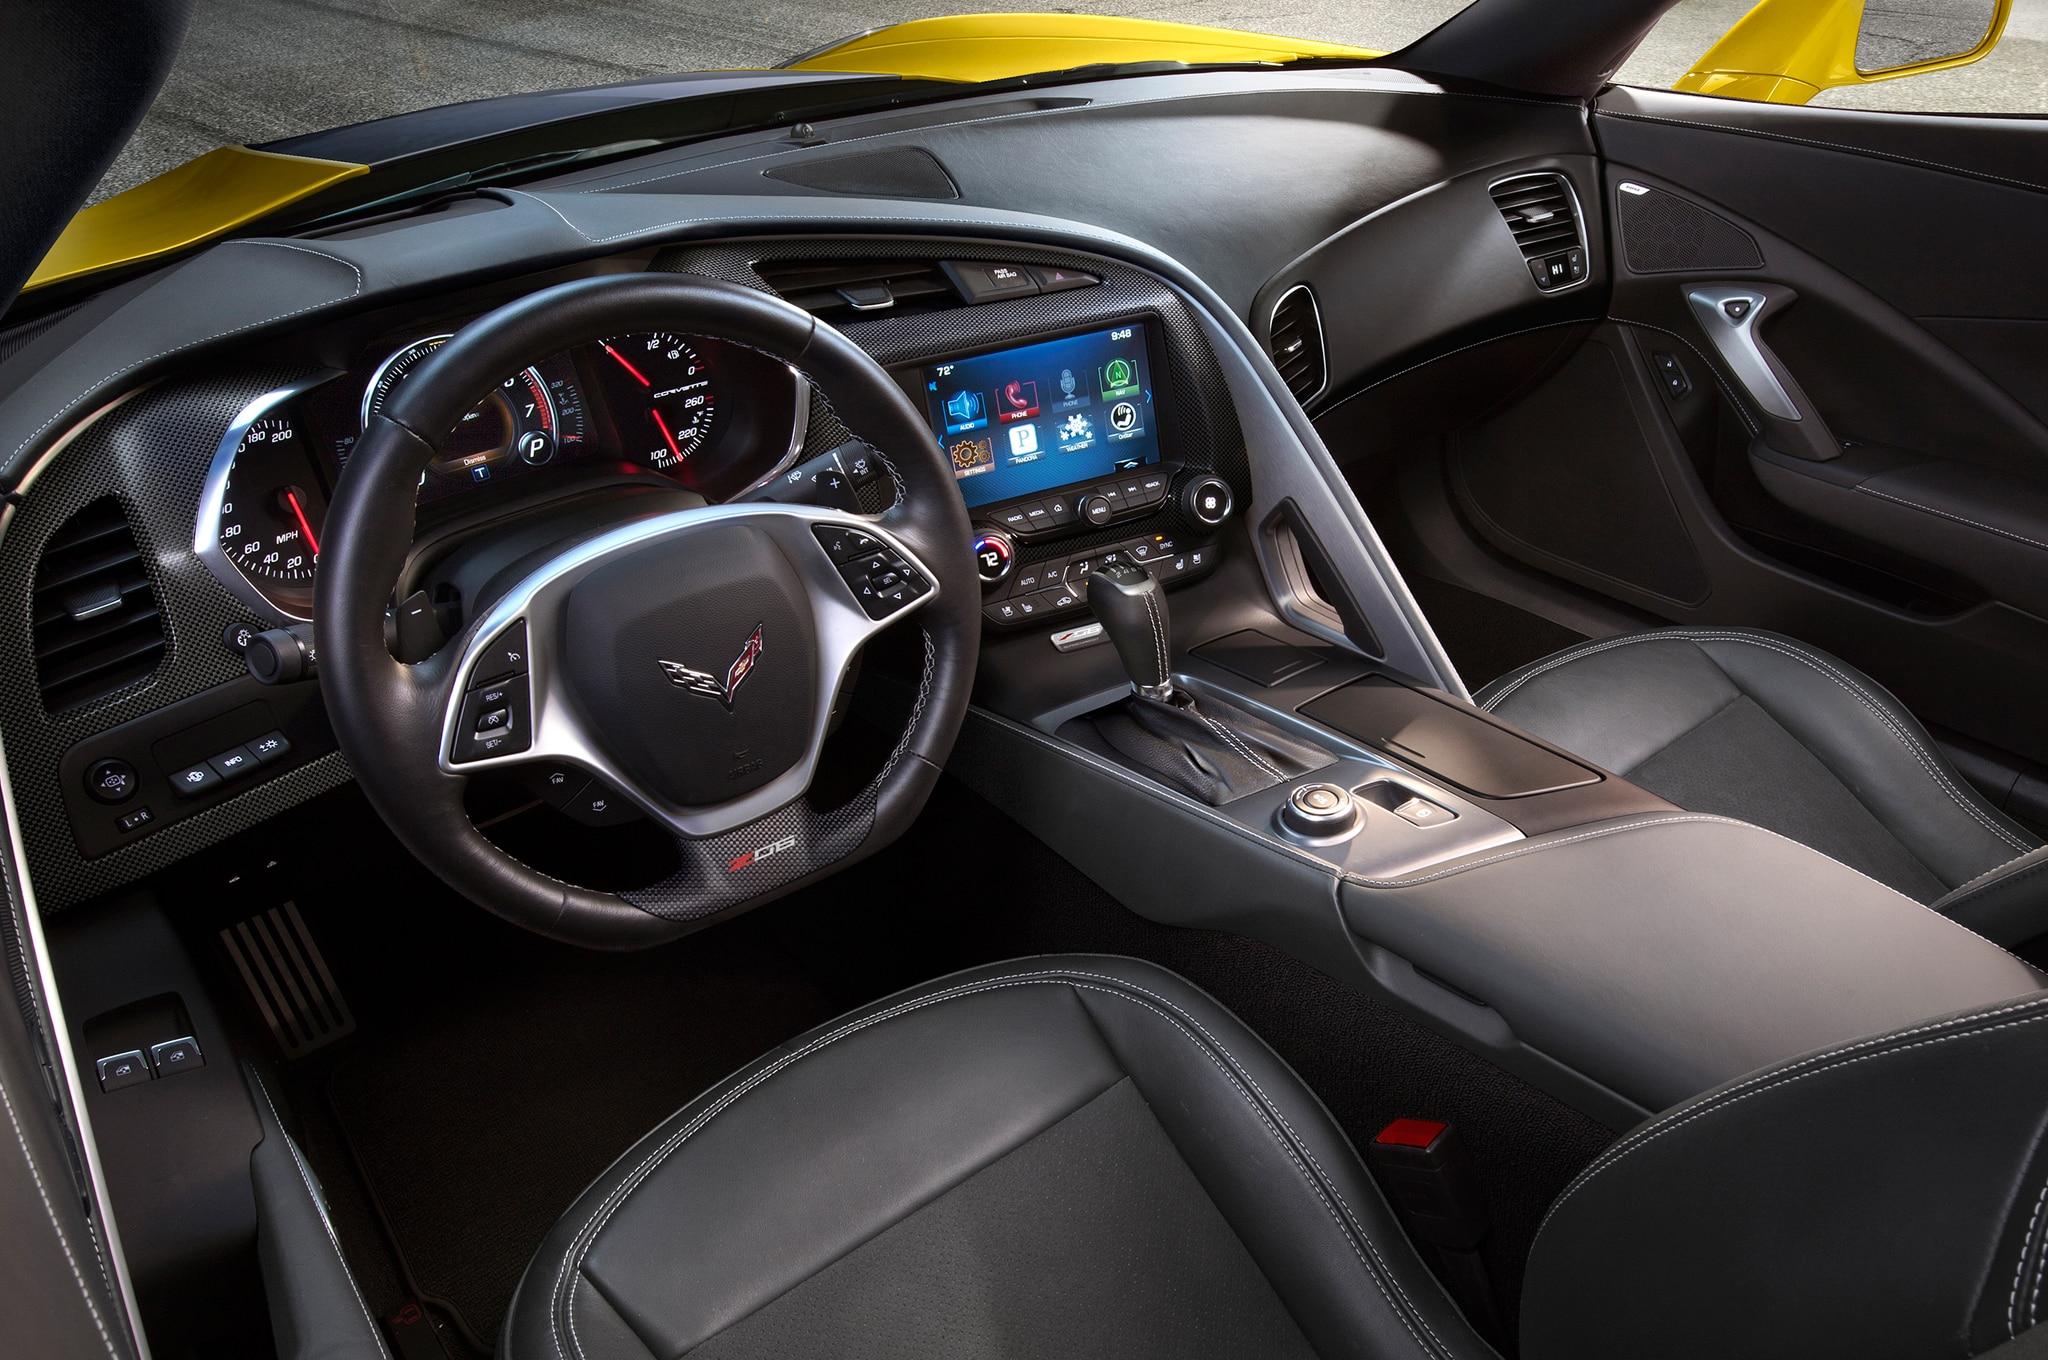 chevrolet corvette interior. enthusiasts chevrolet corvette interior t